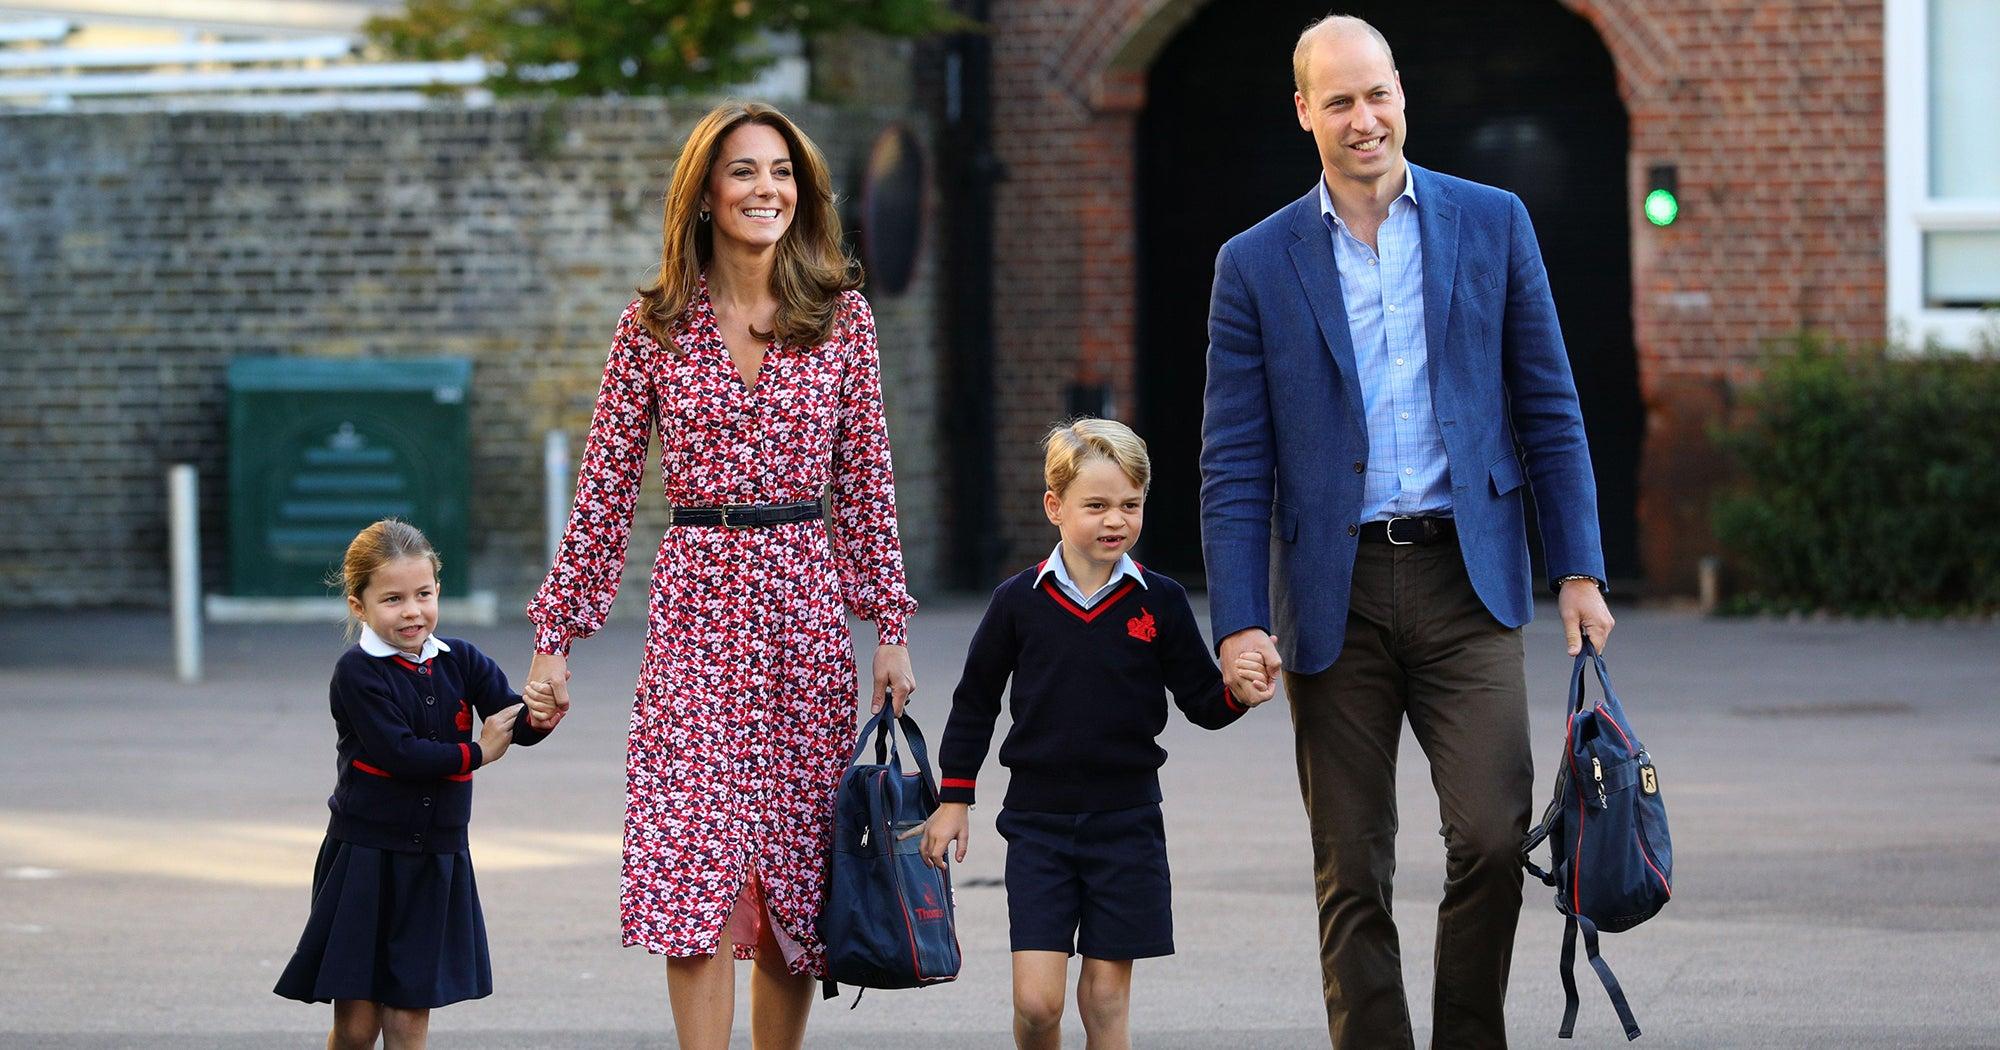 Prince George Princess Charlotte's School Is Having A Coronavirus Scare